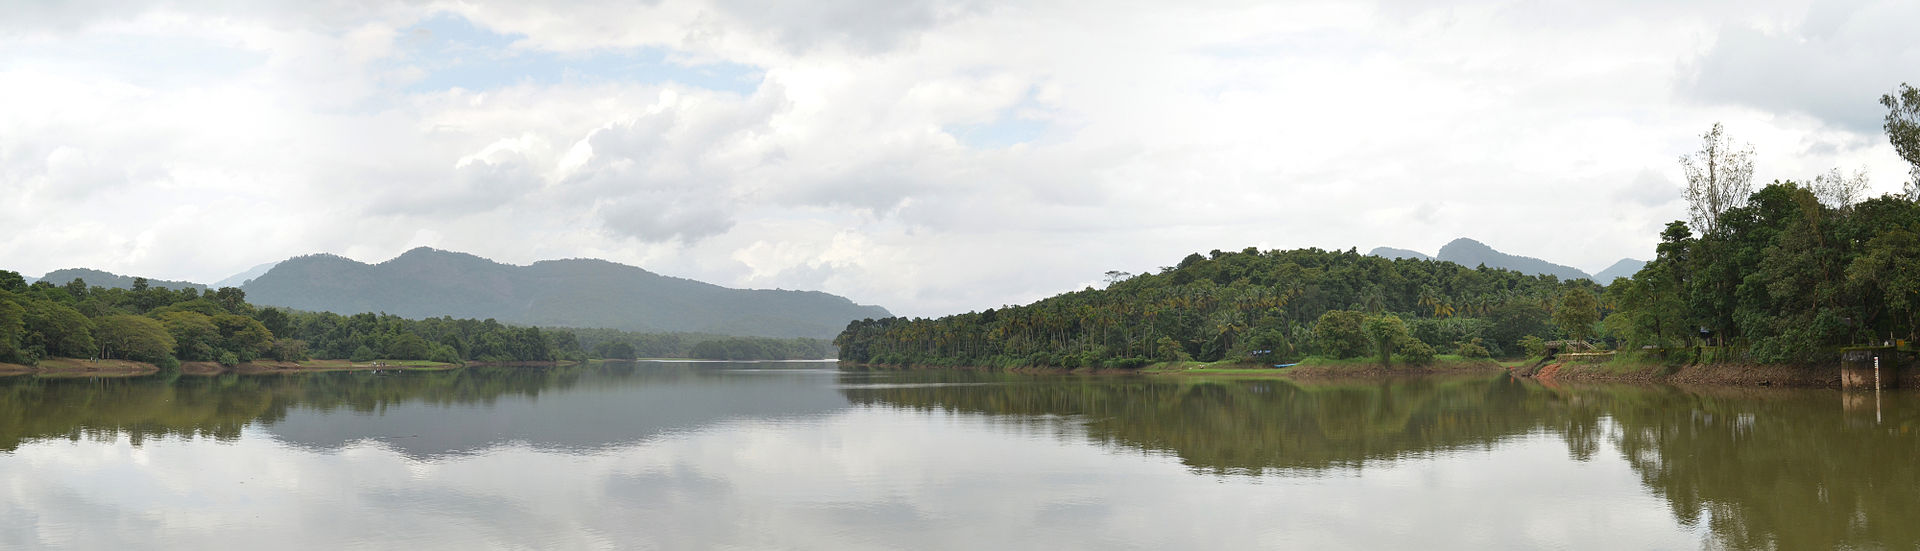 periyar_river_from_dam_dsw.jpg